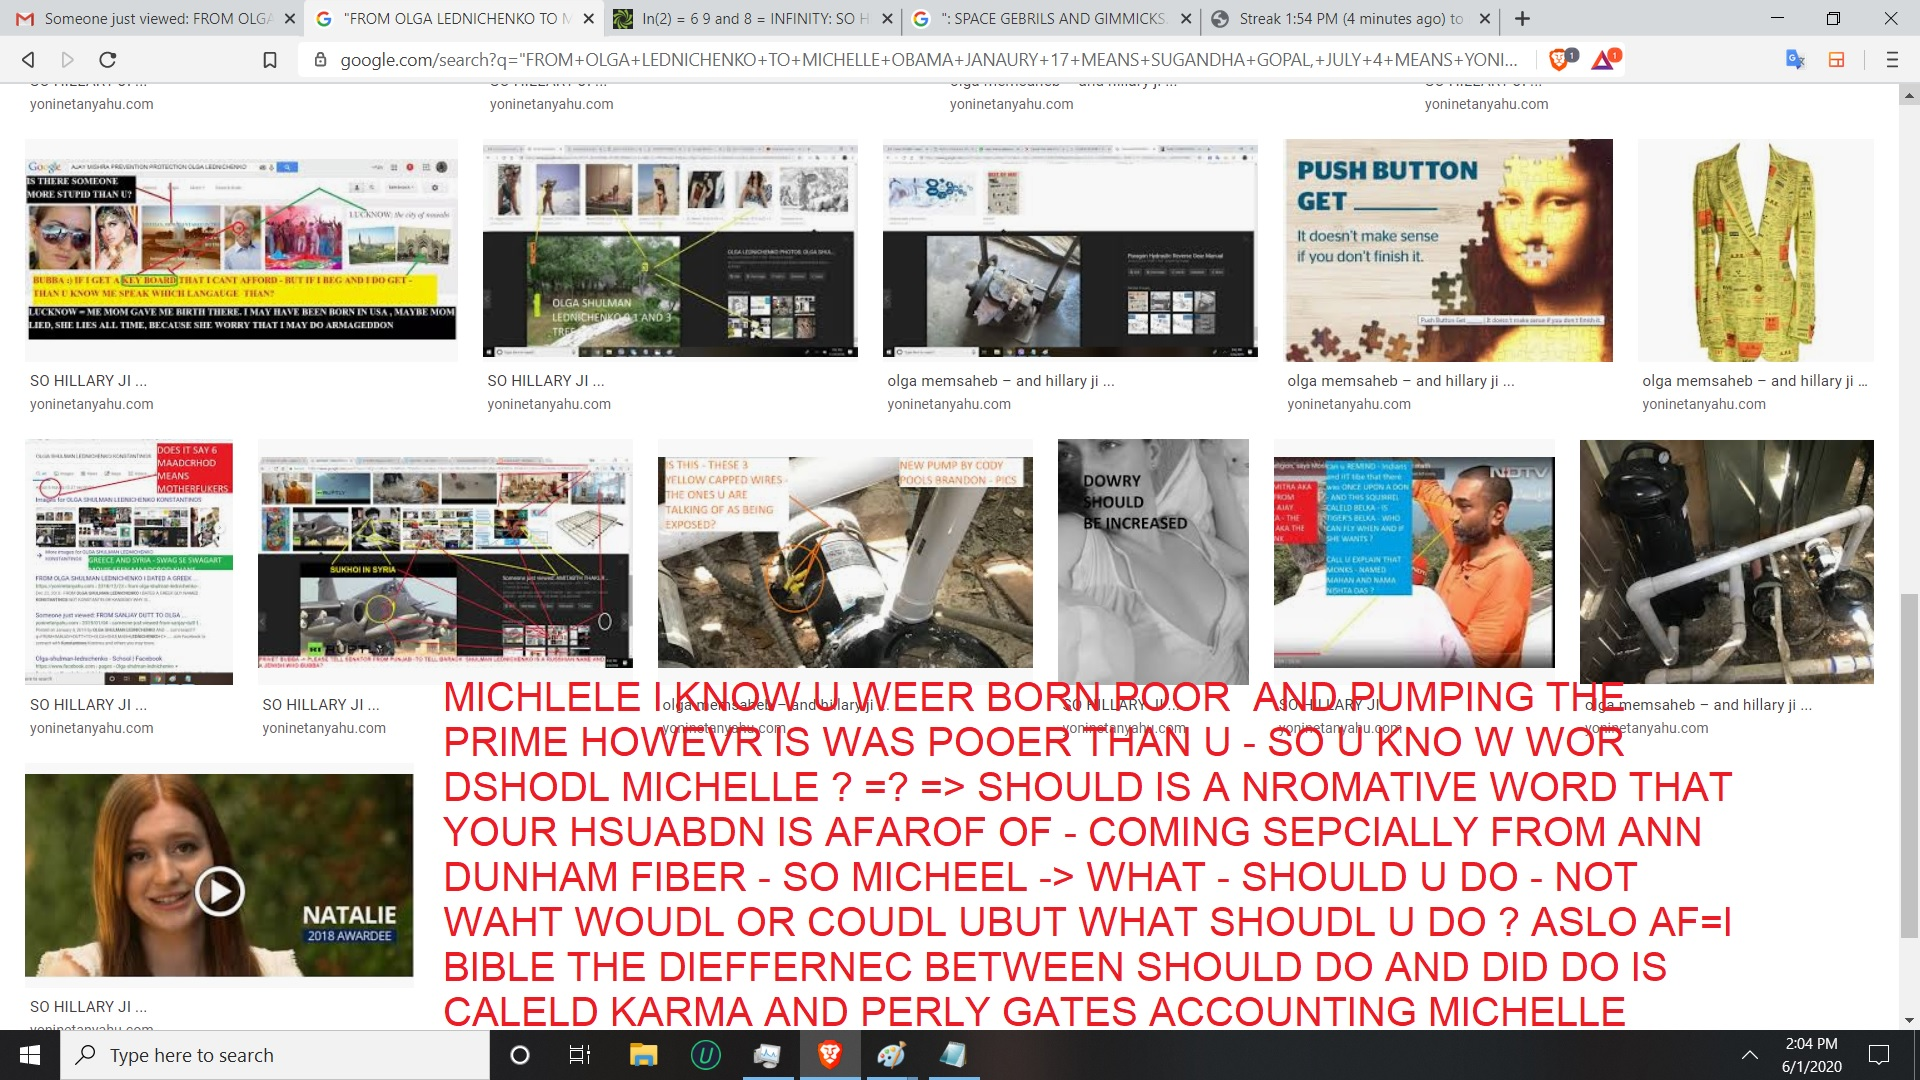 TO MICHELEL OBAMA - NO MICHELLE BARACK MUST CHANGE - NO MENS NO MICHELE